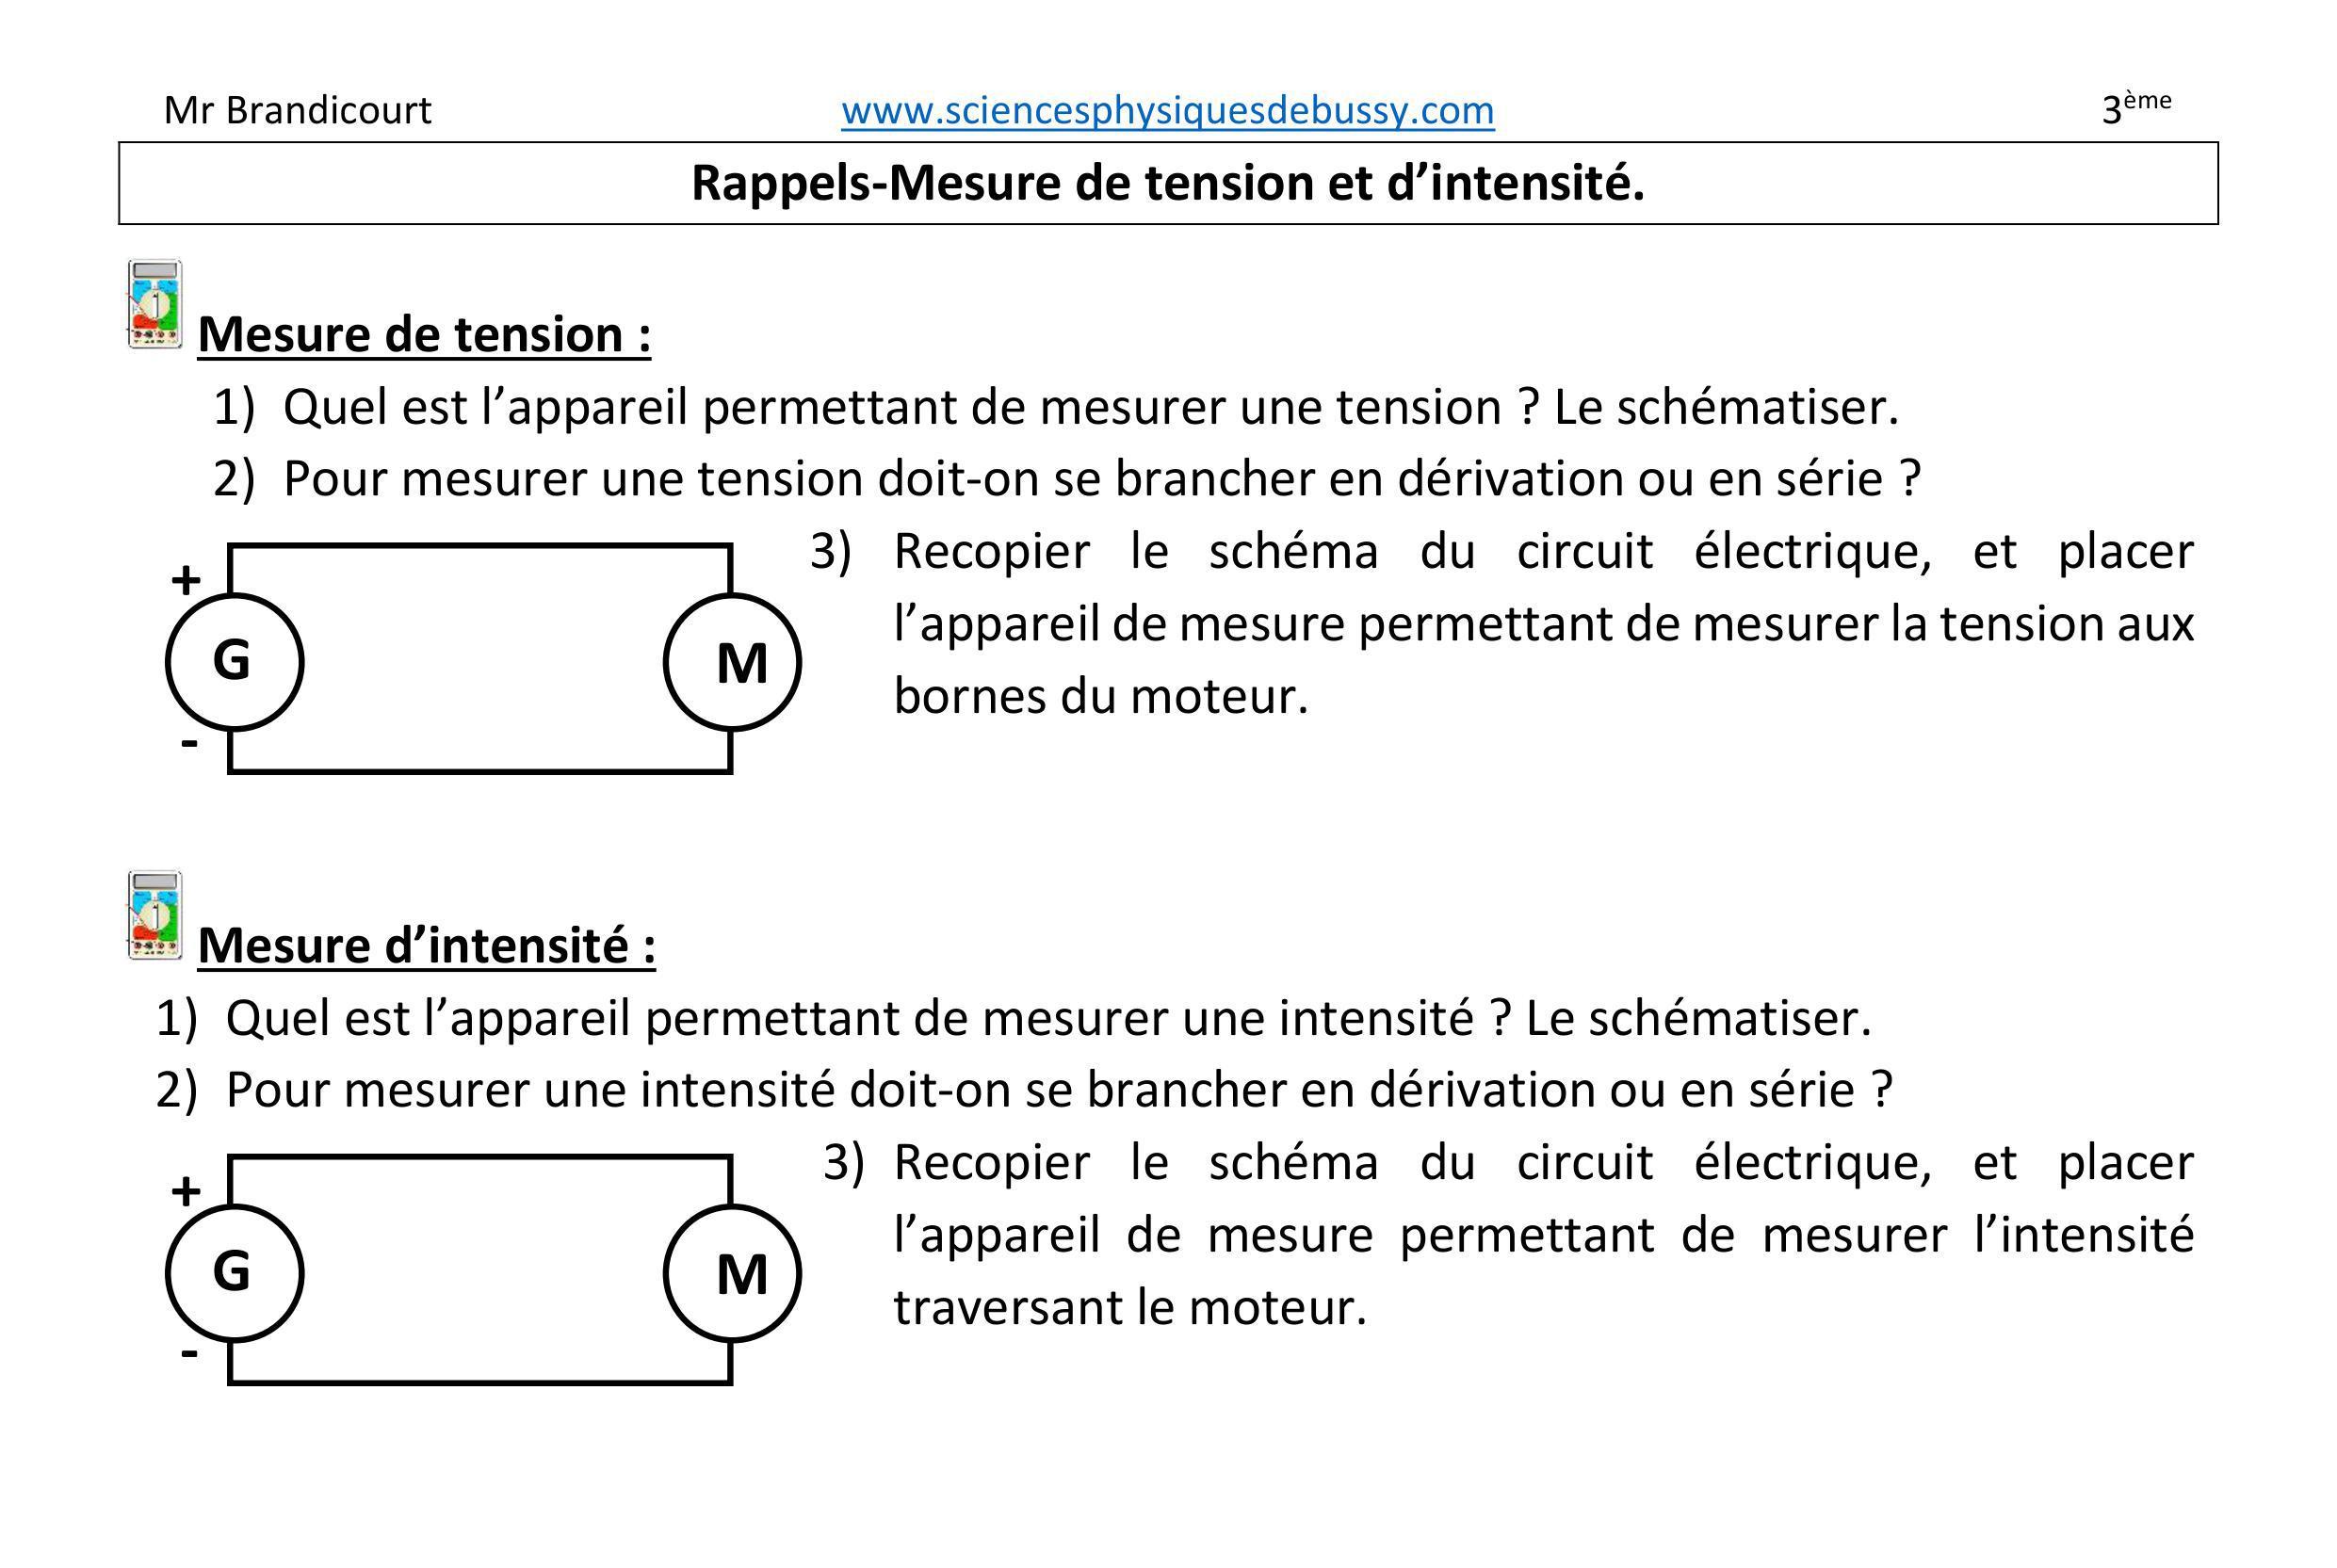 rappels-mesure-de-tension-et-dintensitc3a9-compressed.jpg